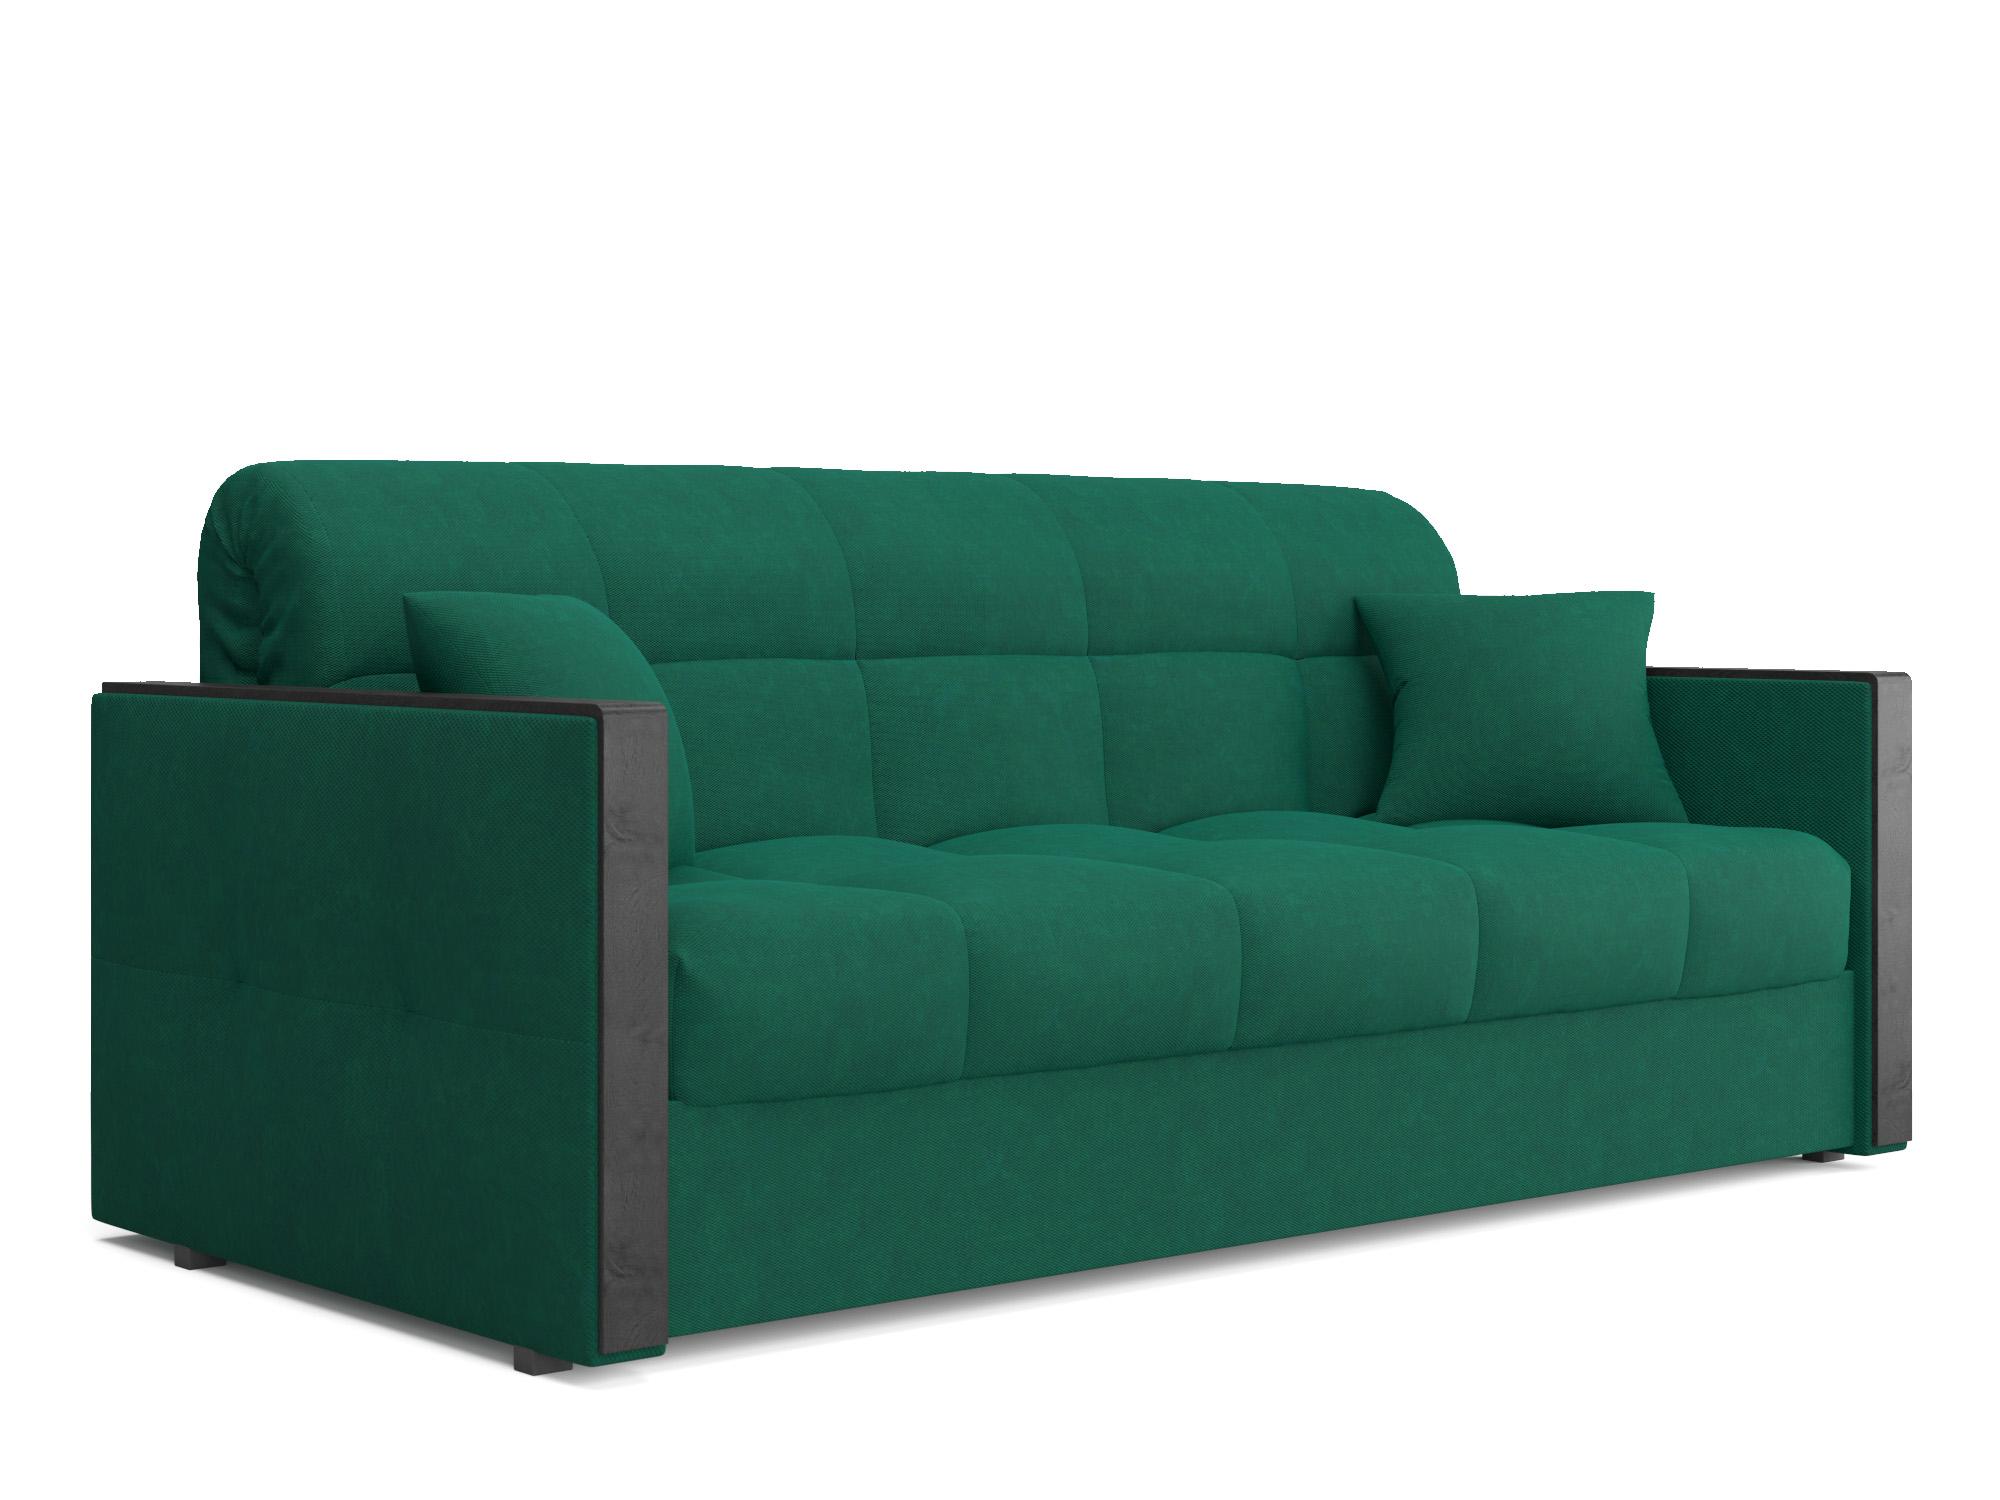 Диван Лион 1,8 MebelVia Зеленый